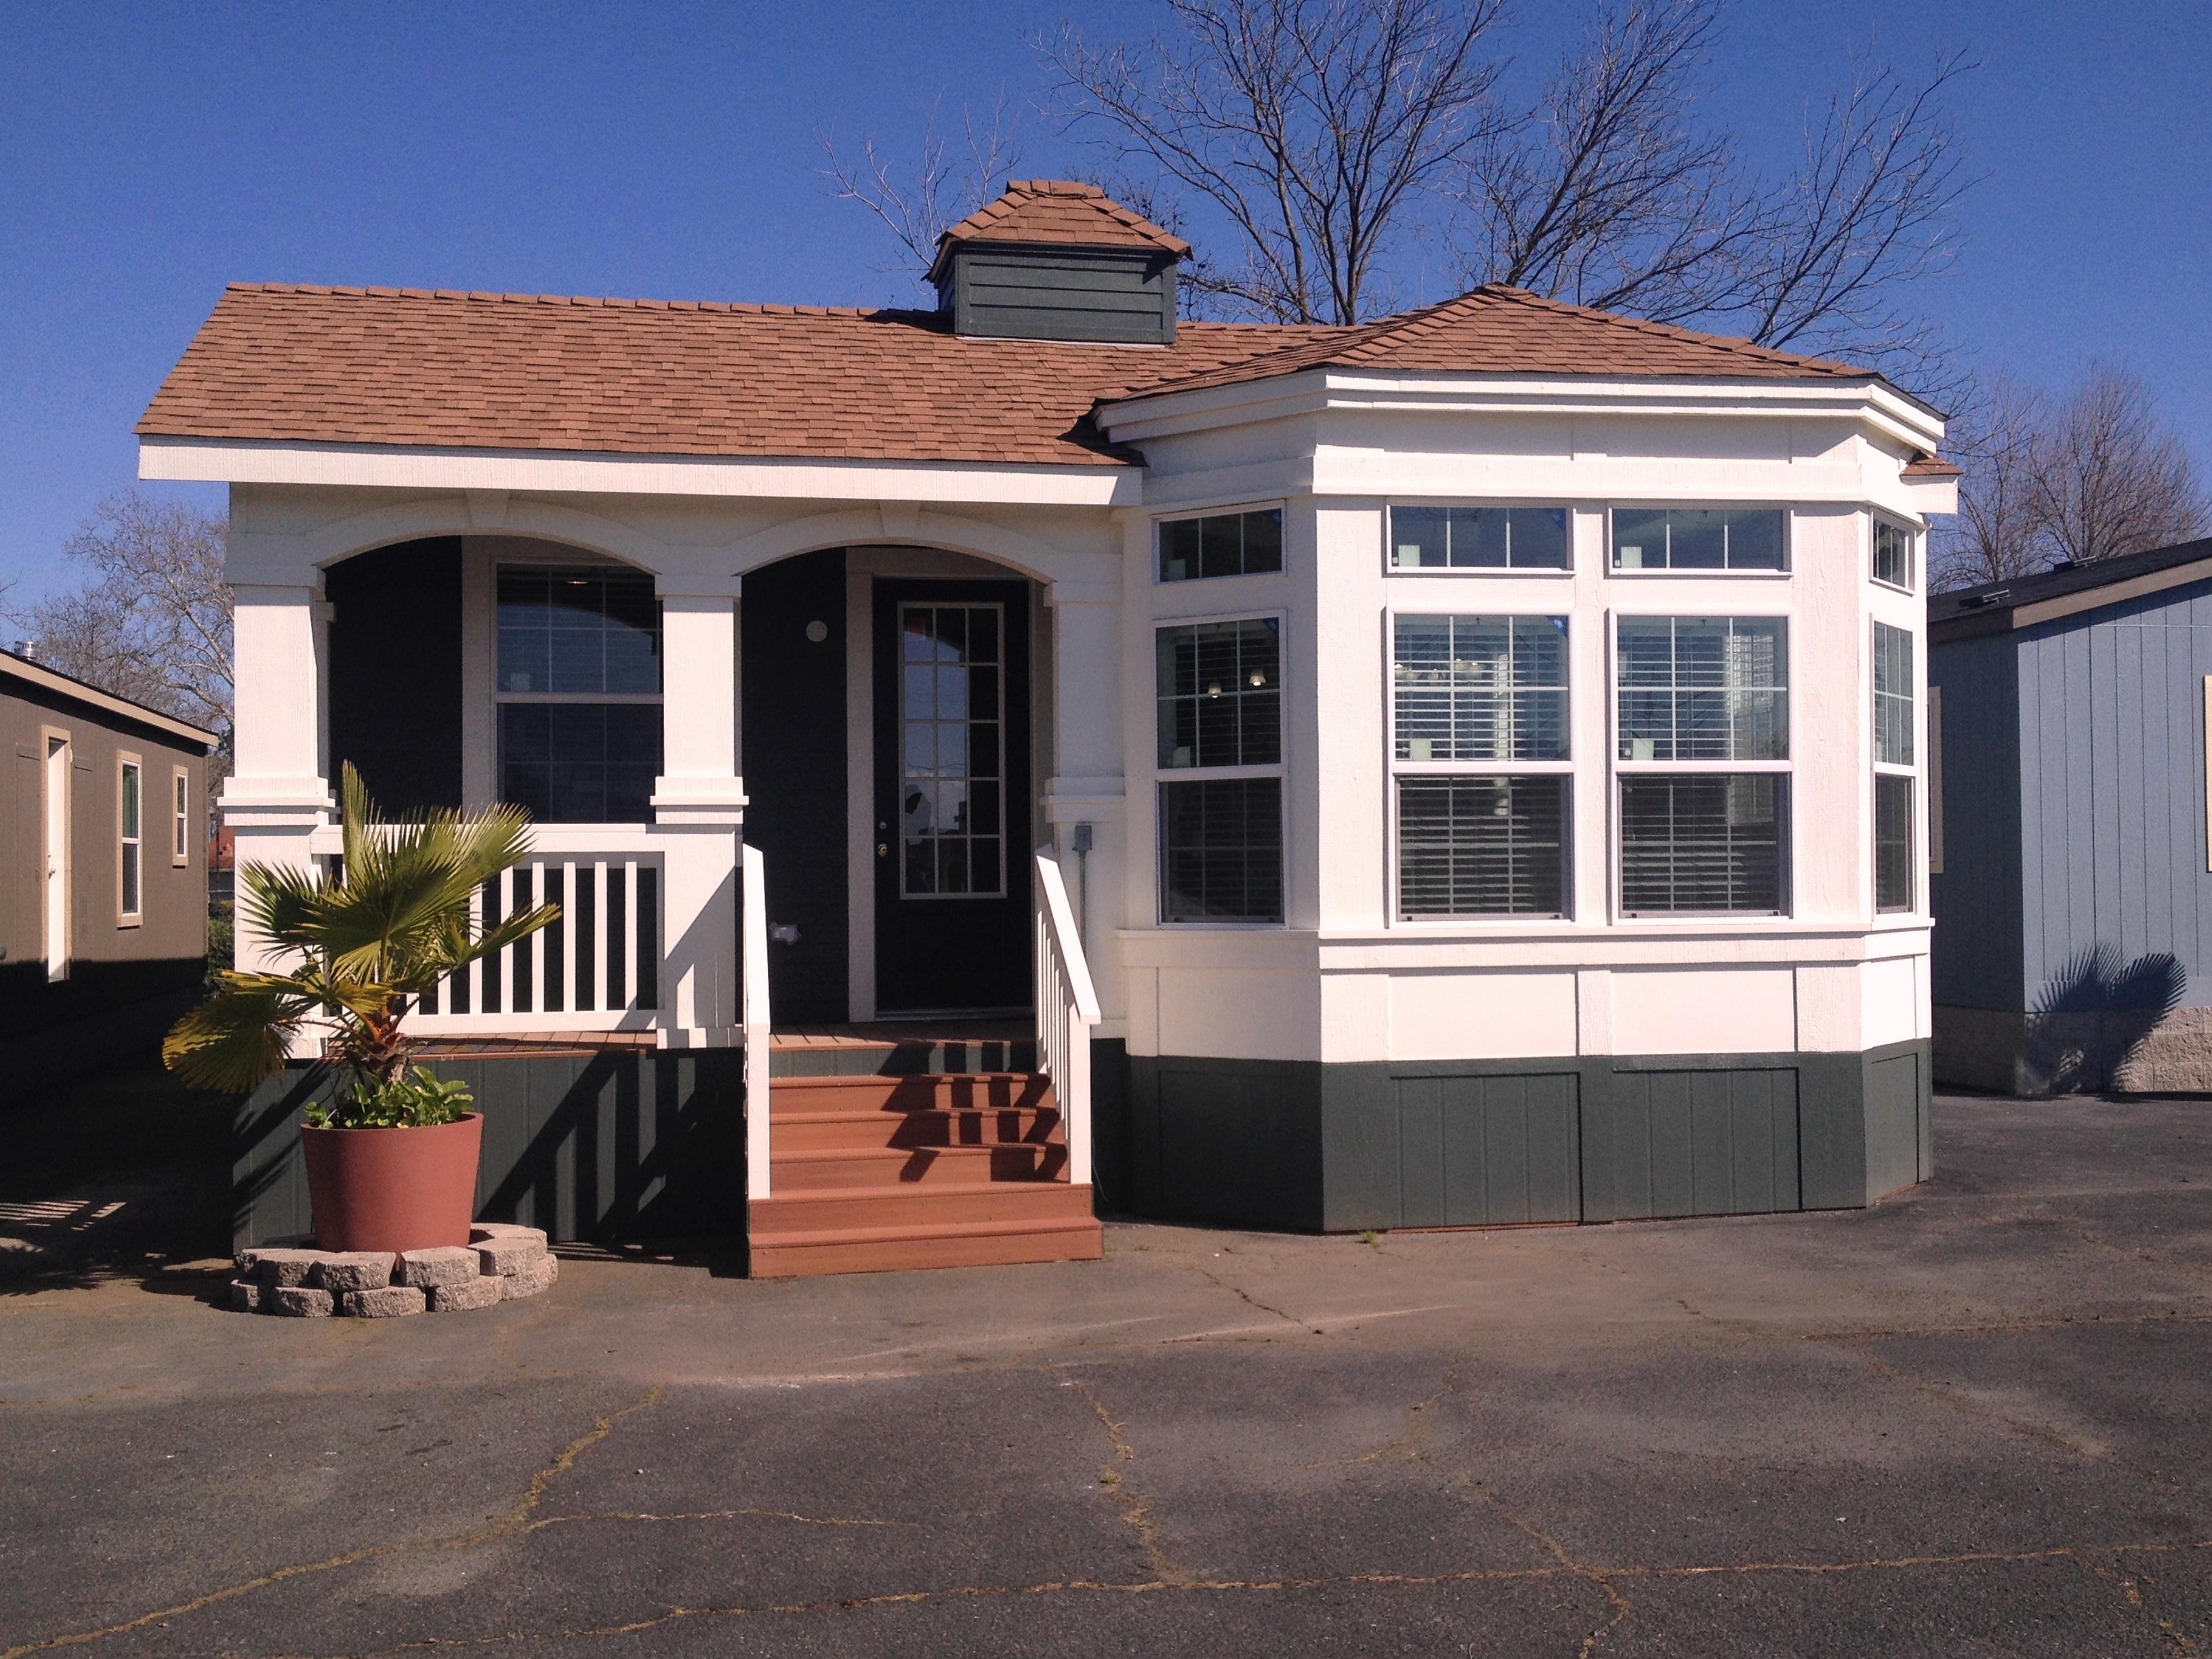 modular homes dealers in west sacramento ca west sacramento rh ibegin com Modular Homes SA Sacramen Modular Homes